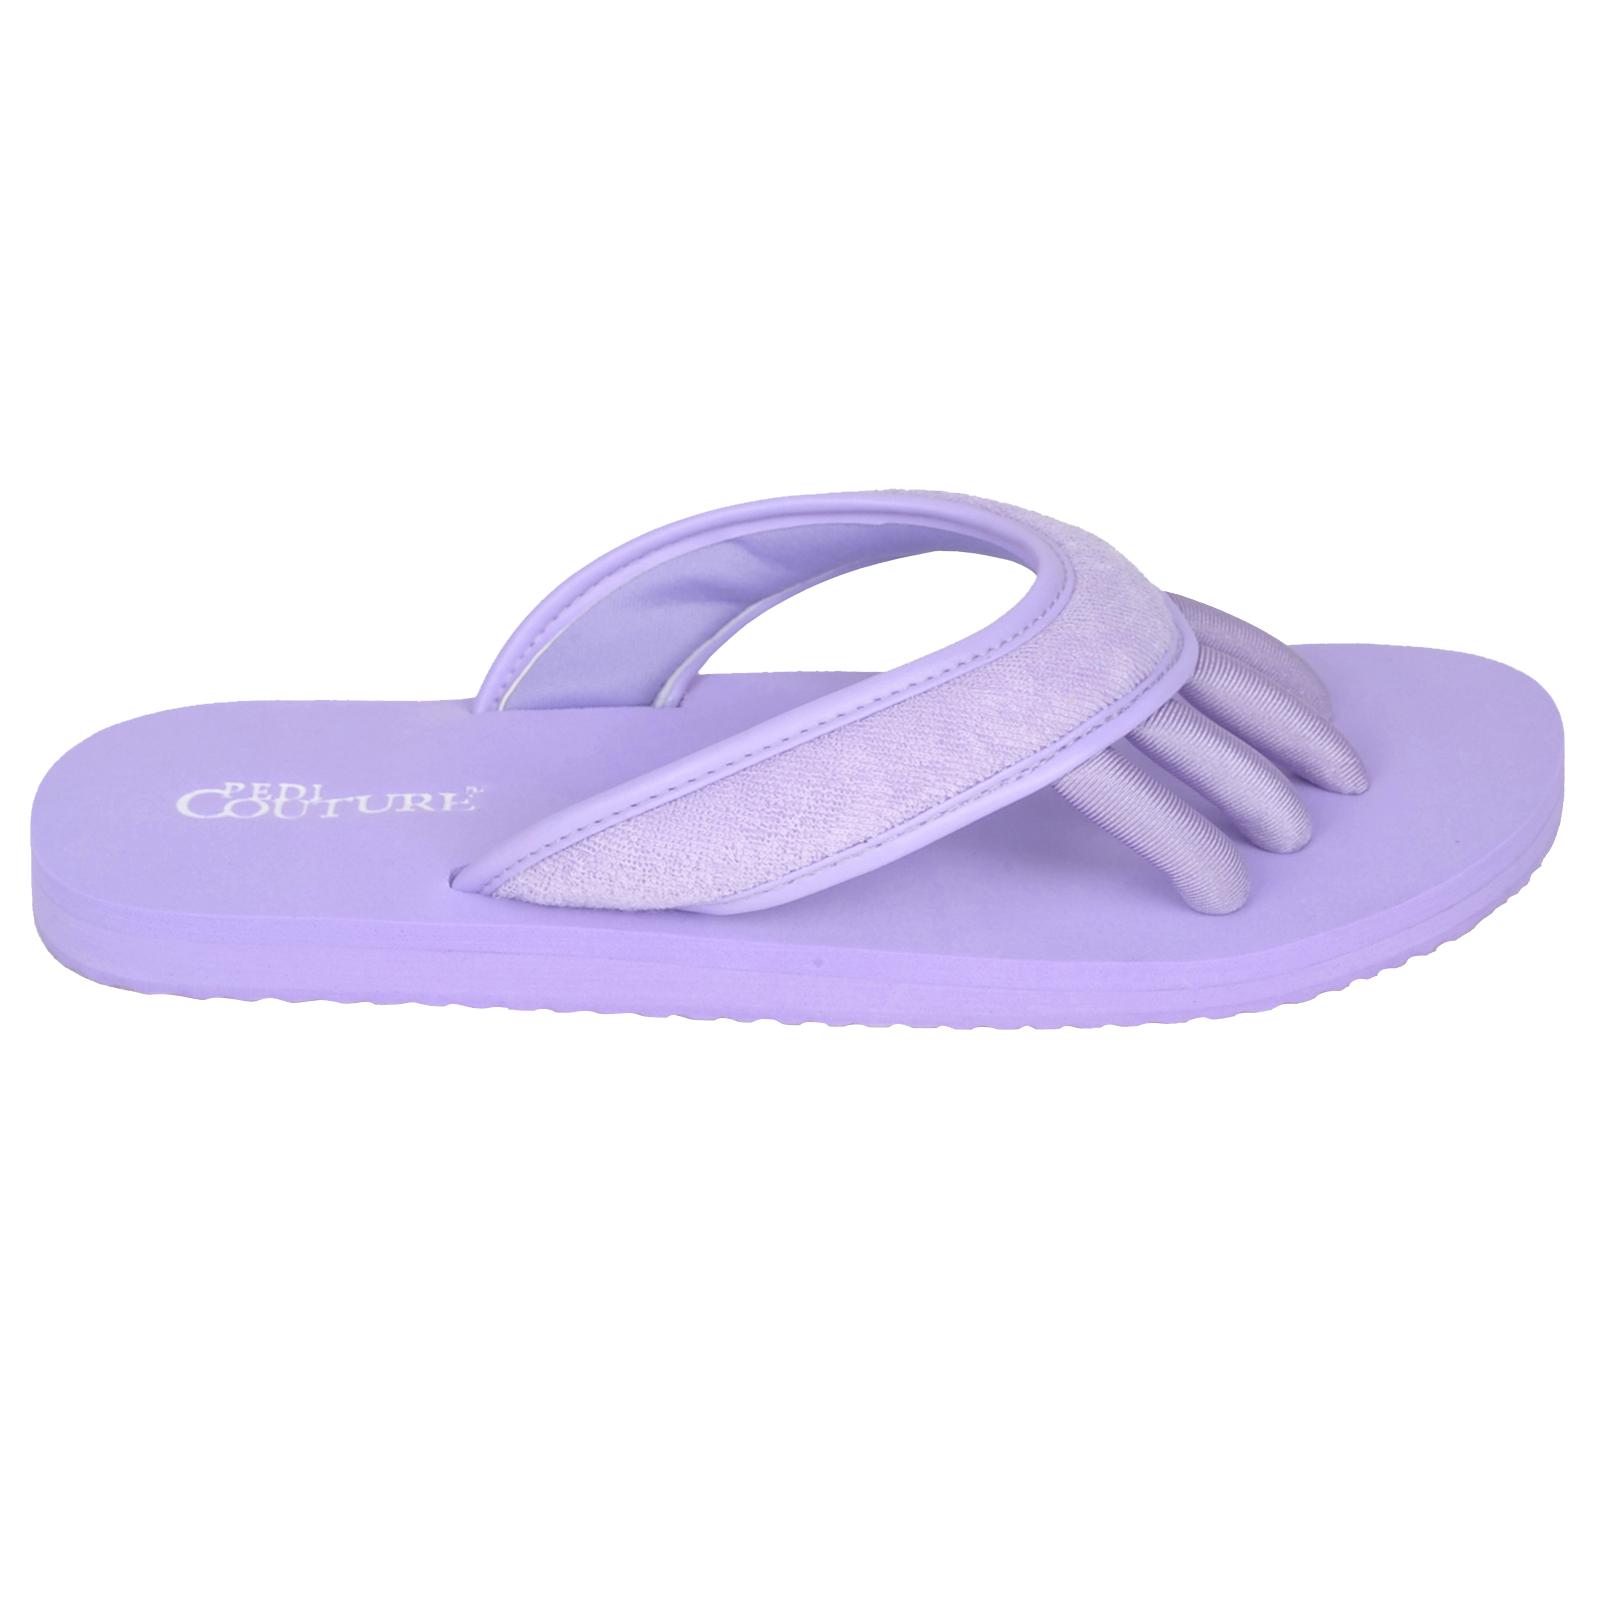 0d378a40a pedicure flip flops cheap   OFF61% Discounted